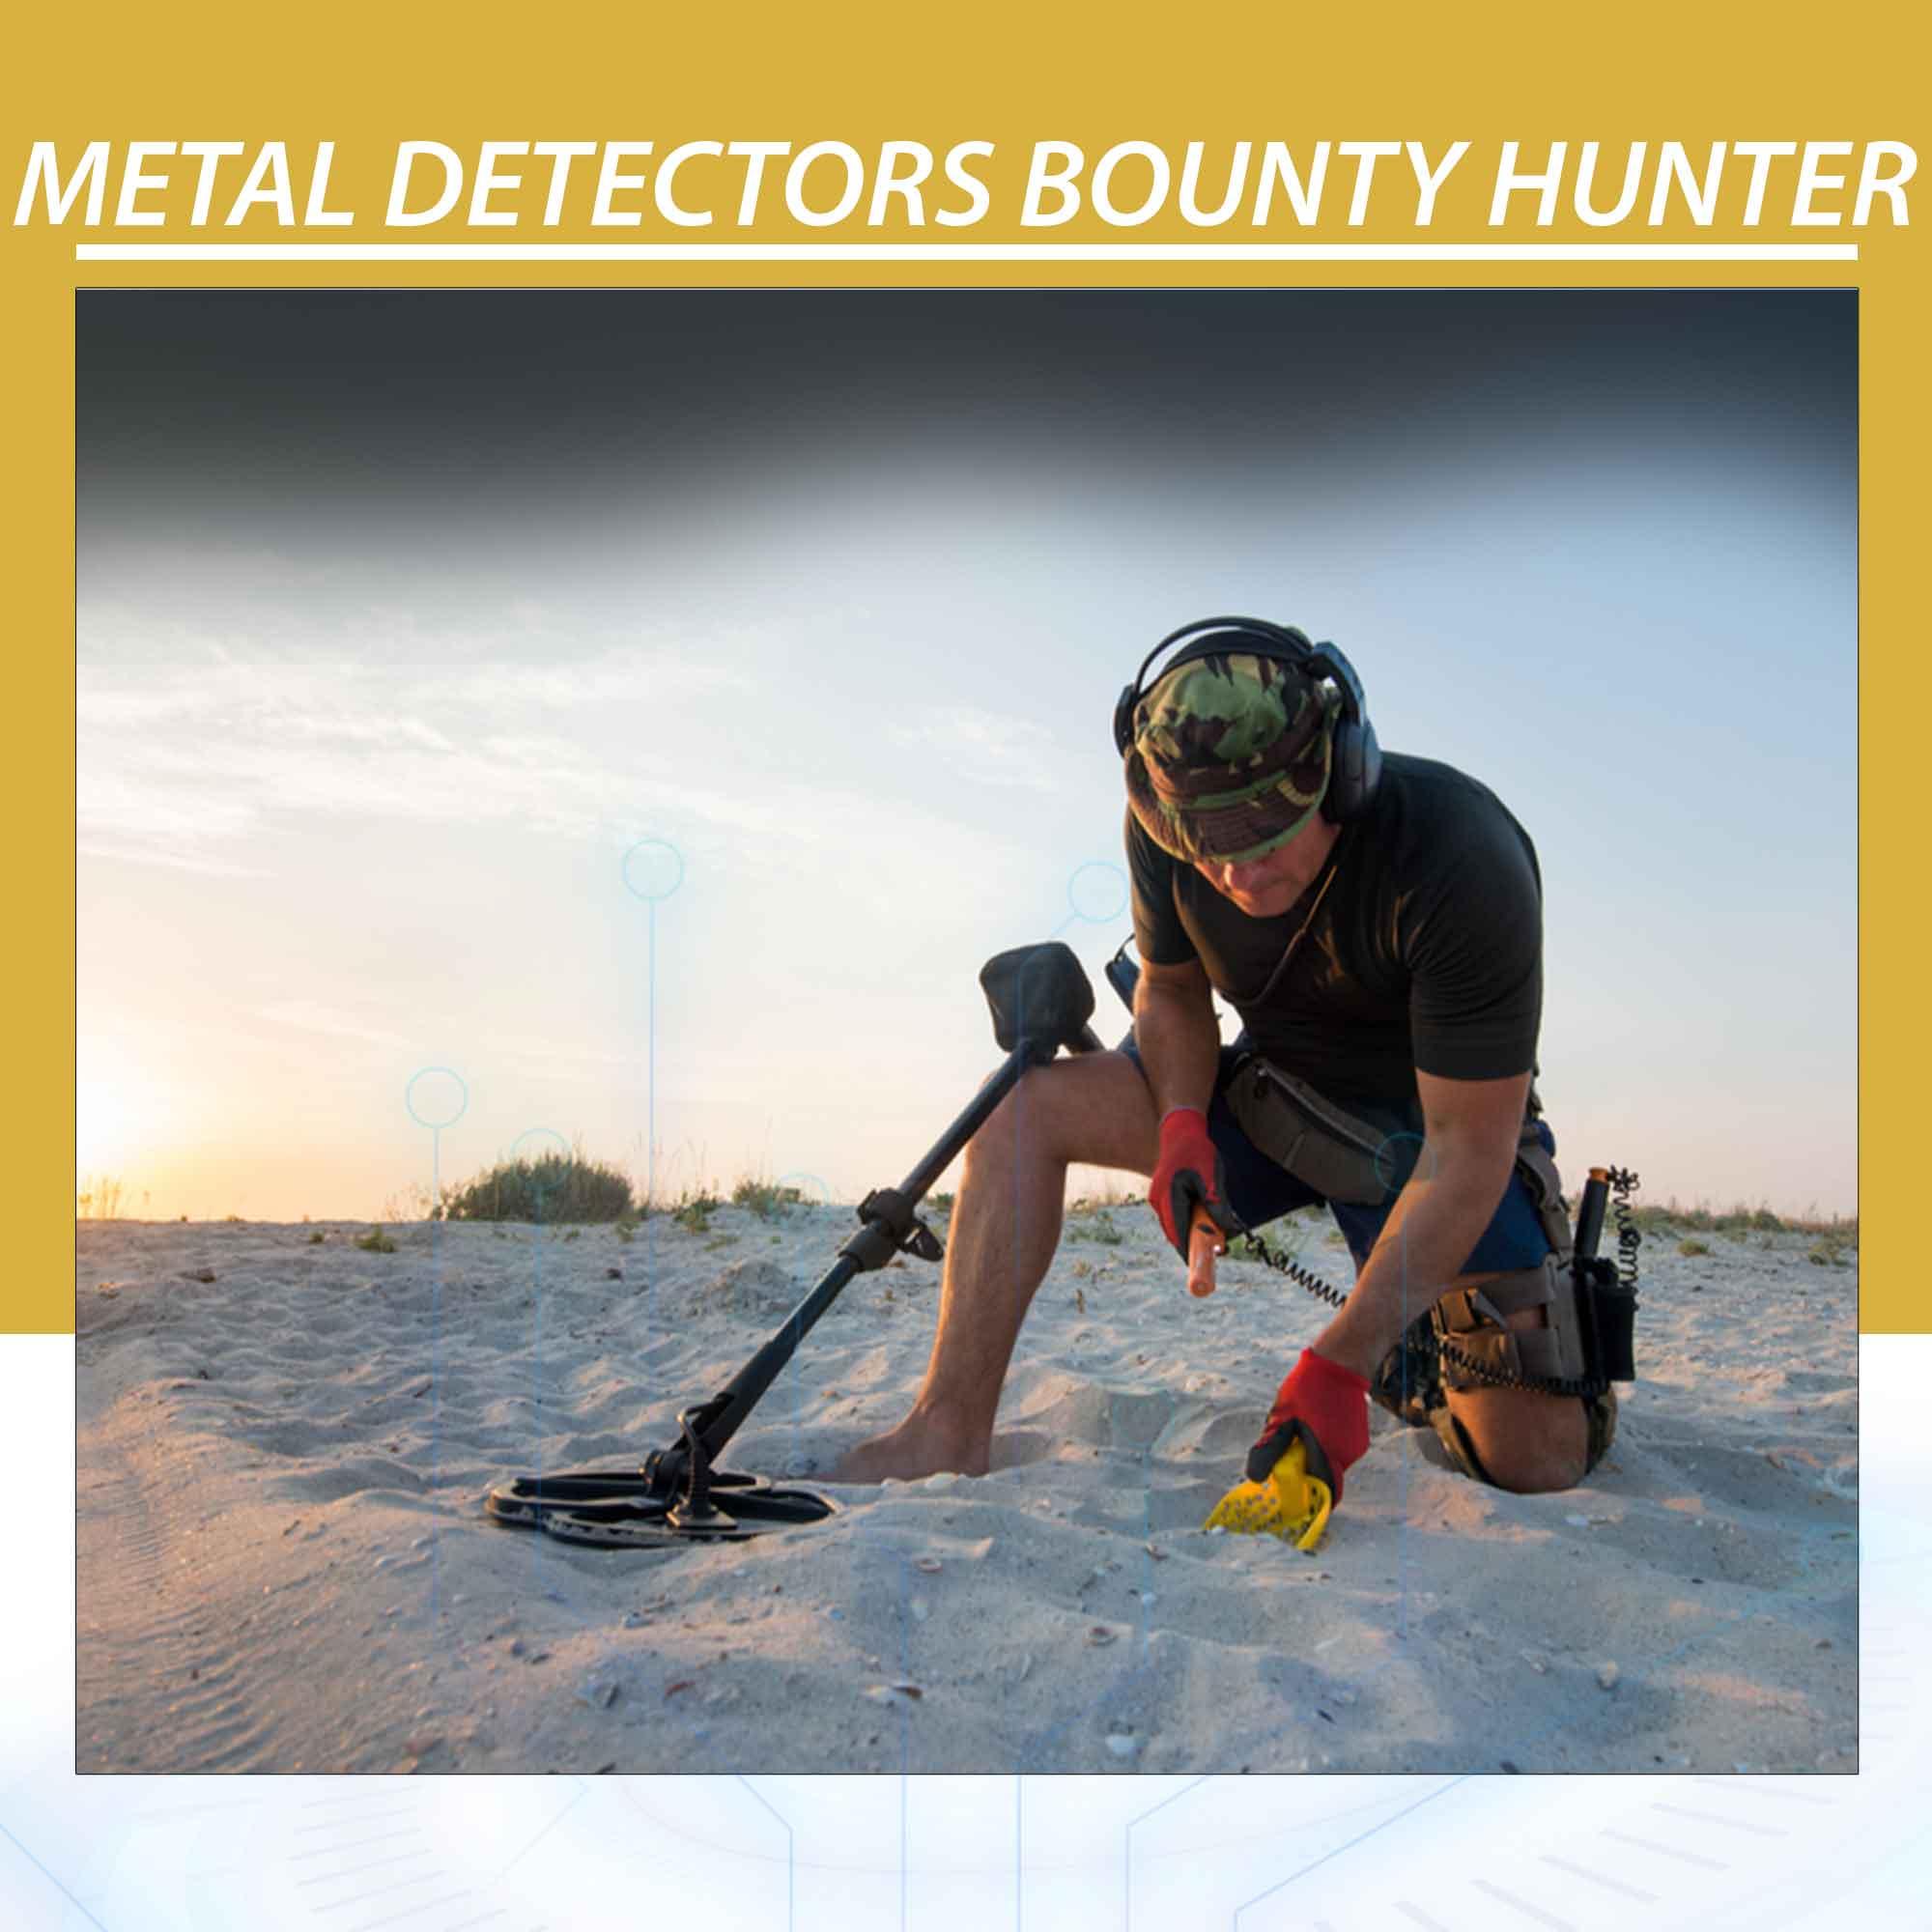 Metal Detectors Bounty Hunter